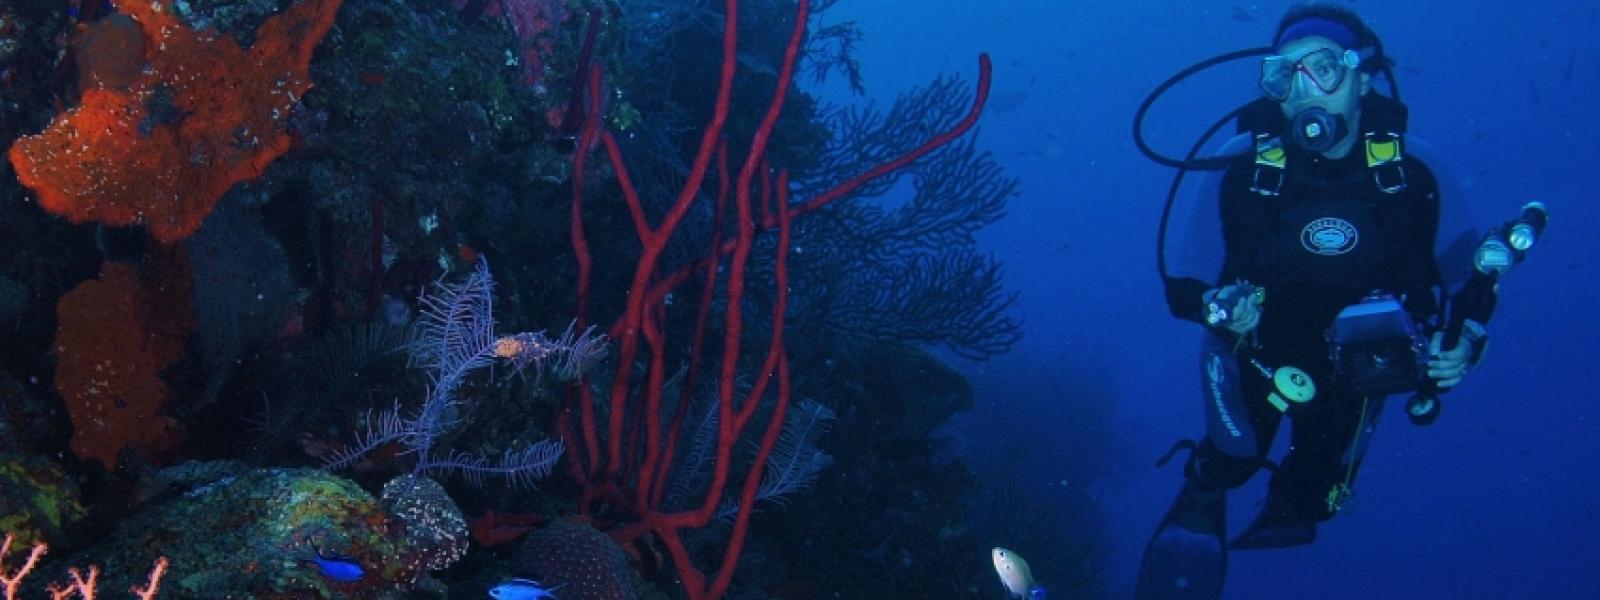 Arrecifes de coral en Cozumel, México.